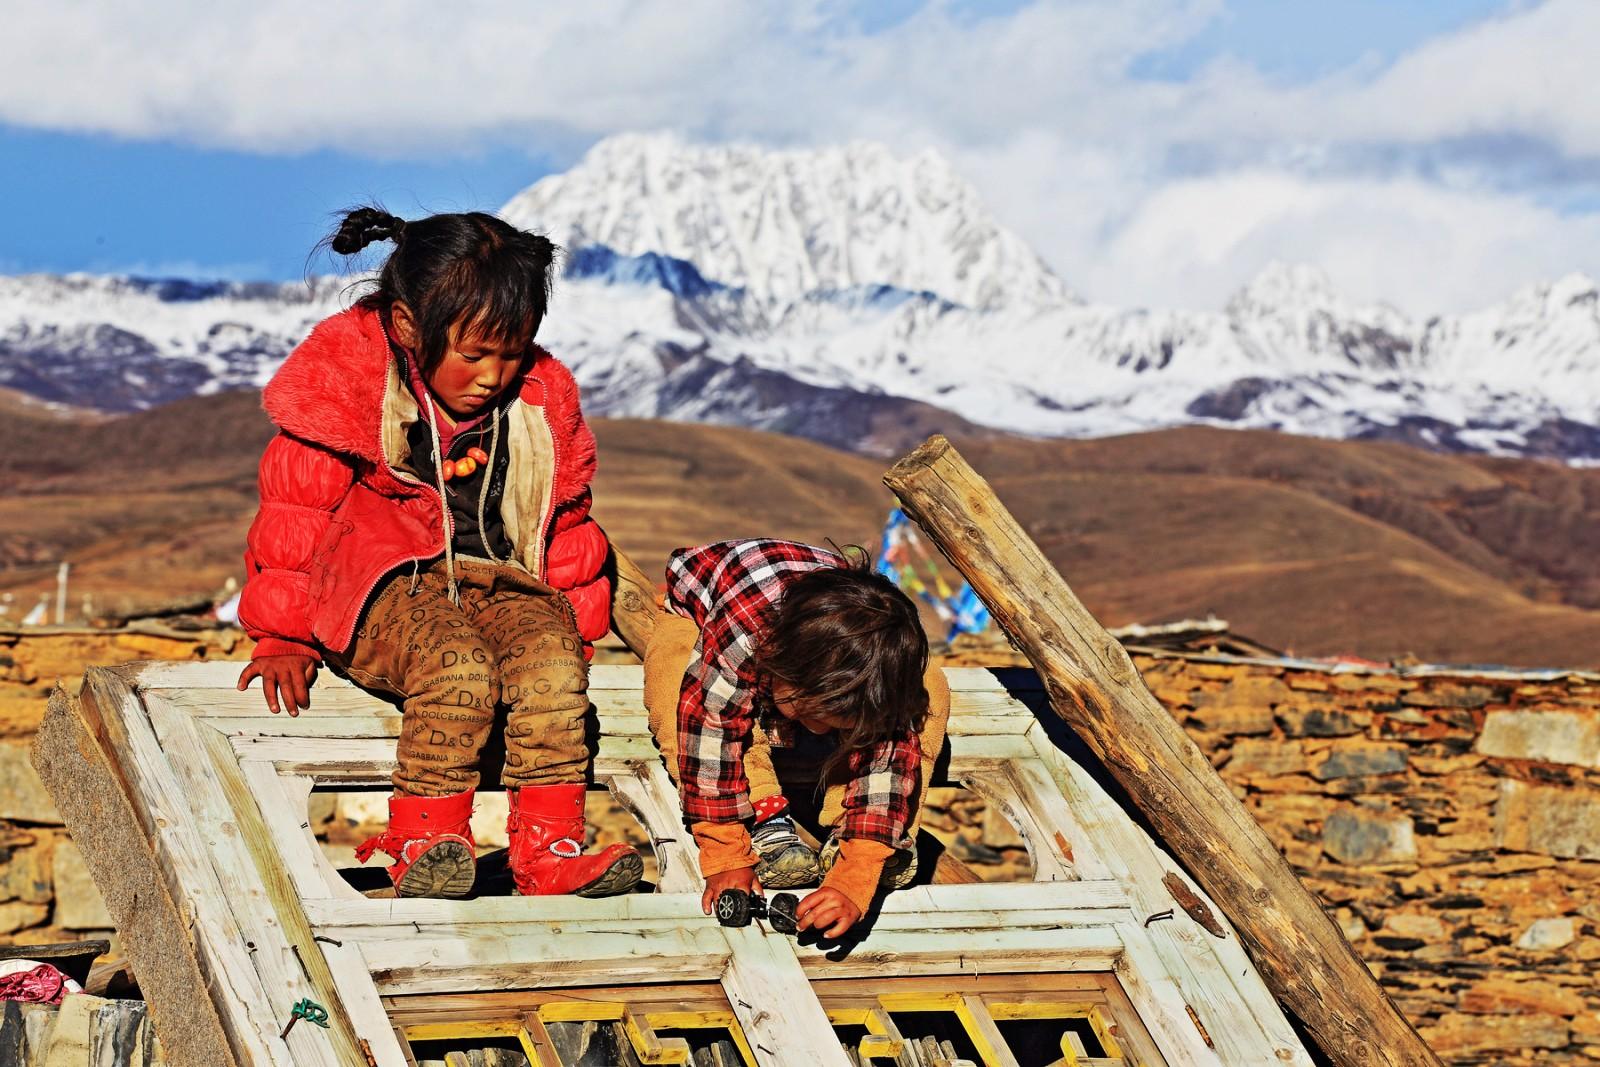 Re:[原创]要进藏区的那位爷 代劳先深吻一下我的香巴拉 我下个月再去